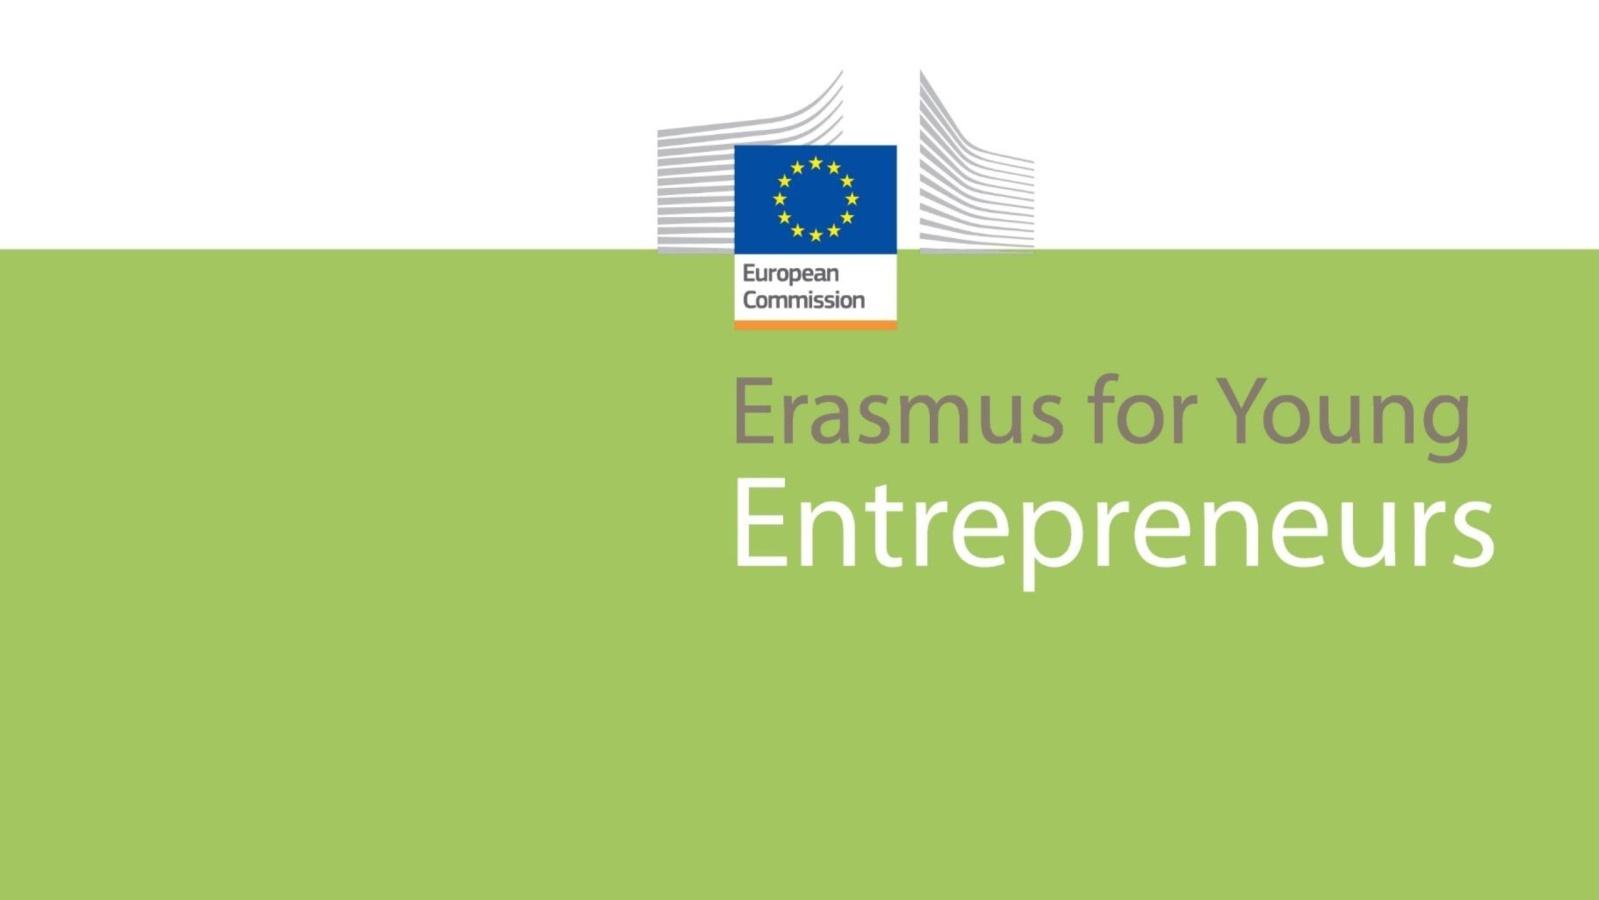 smokinya_internships-erasmus-for-young-entrepreneurs_001.jpg